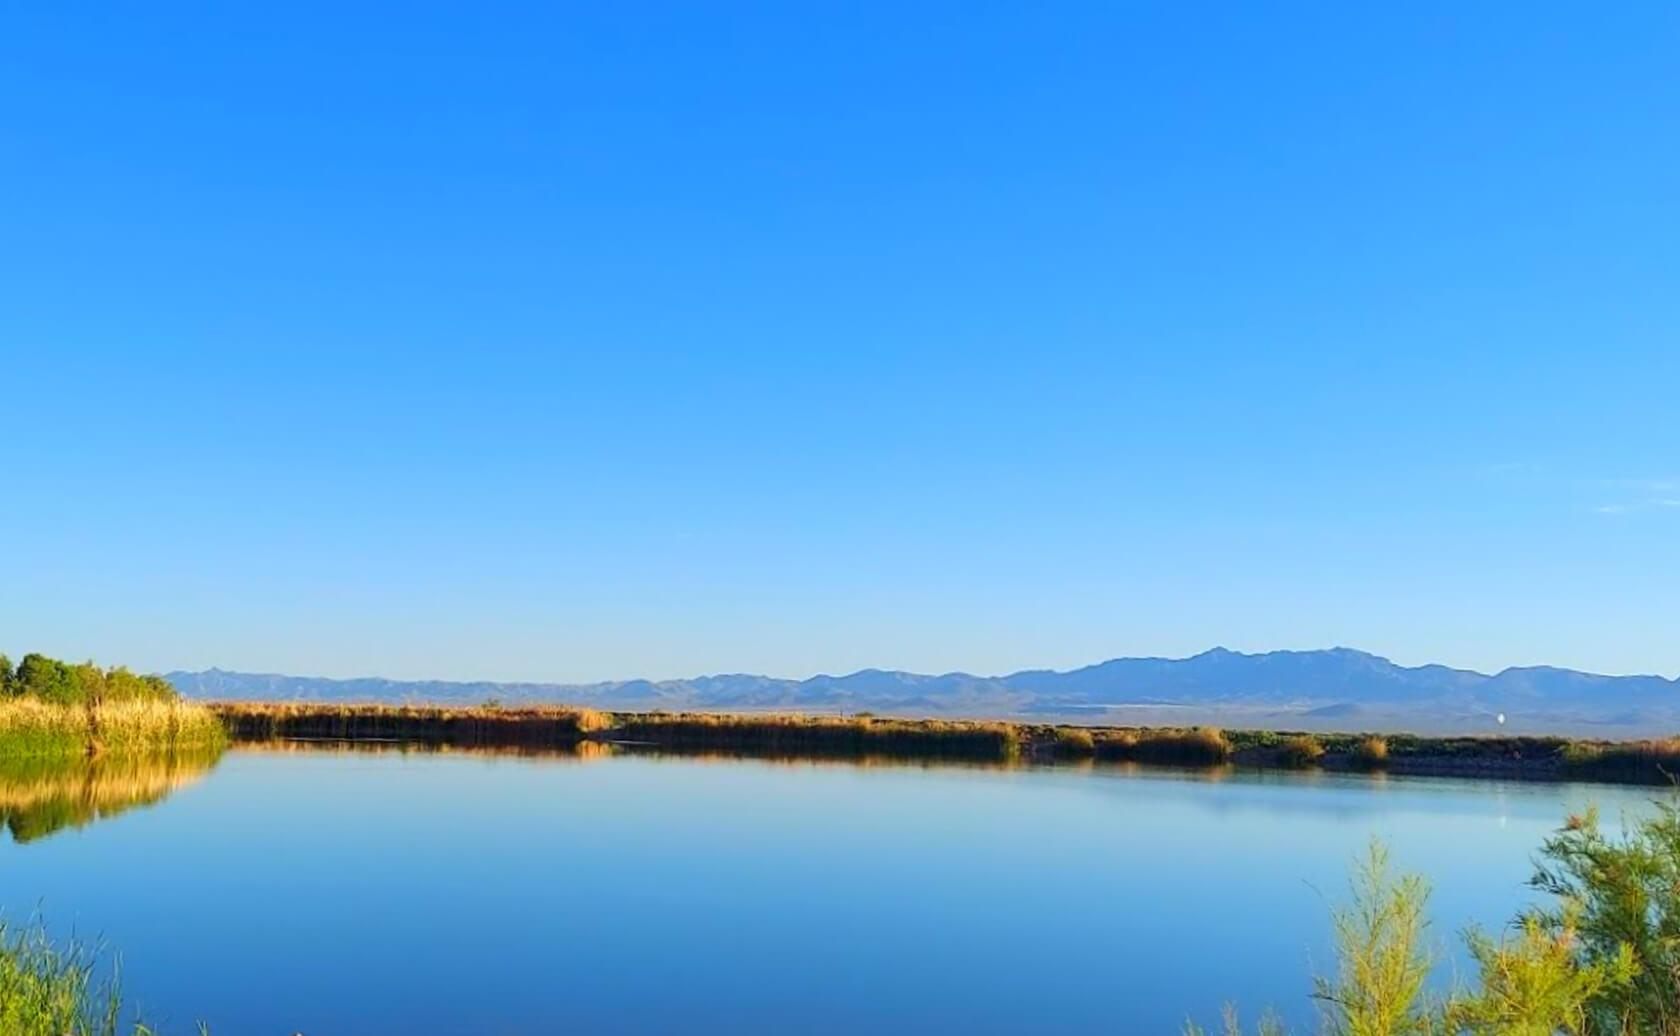 Roper-Lake-Fishing-Guide-Report-Safford-AZ-01